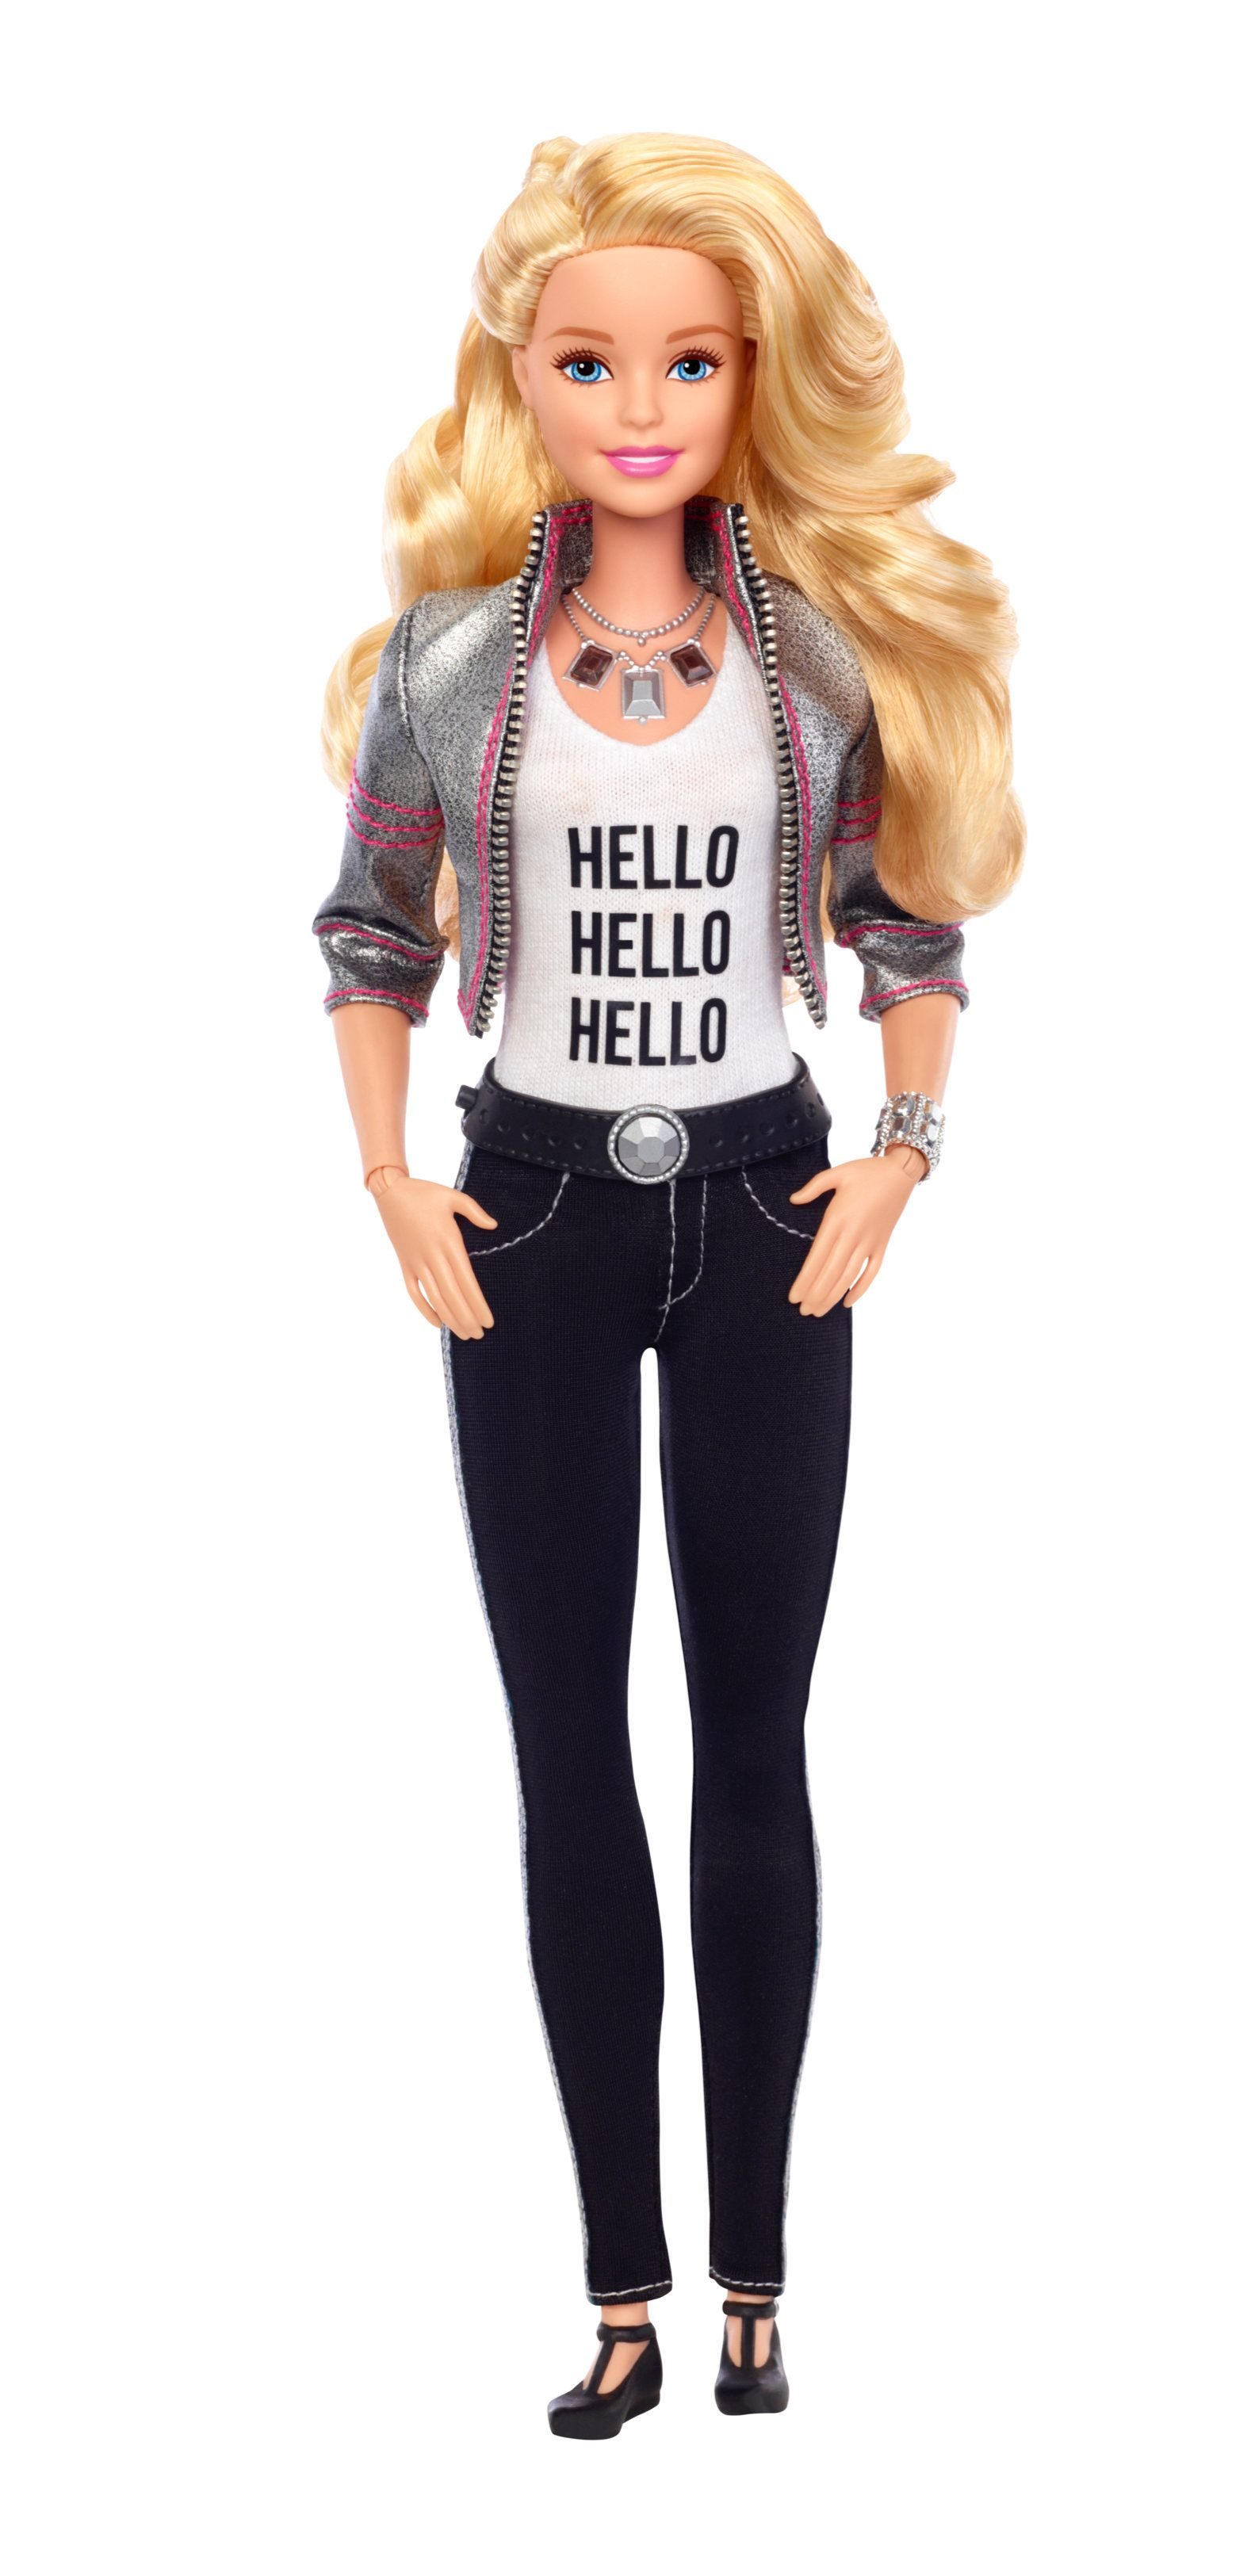 Hello Barbie Goodbye Privacy Hacker Raises Security